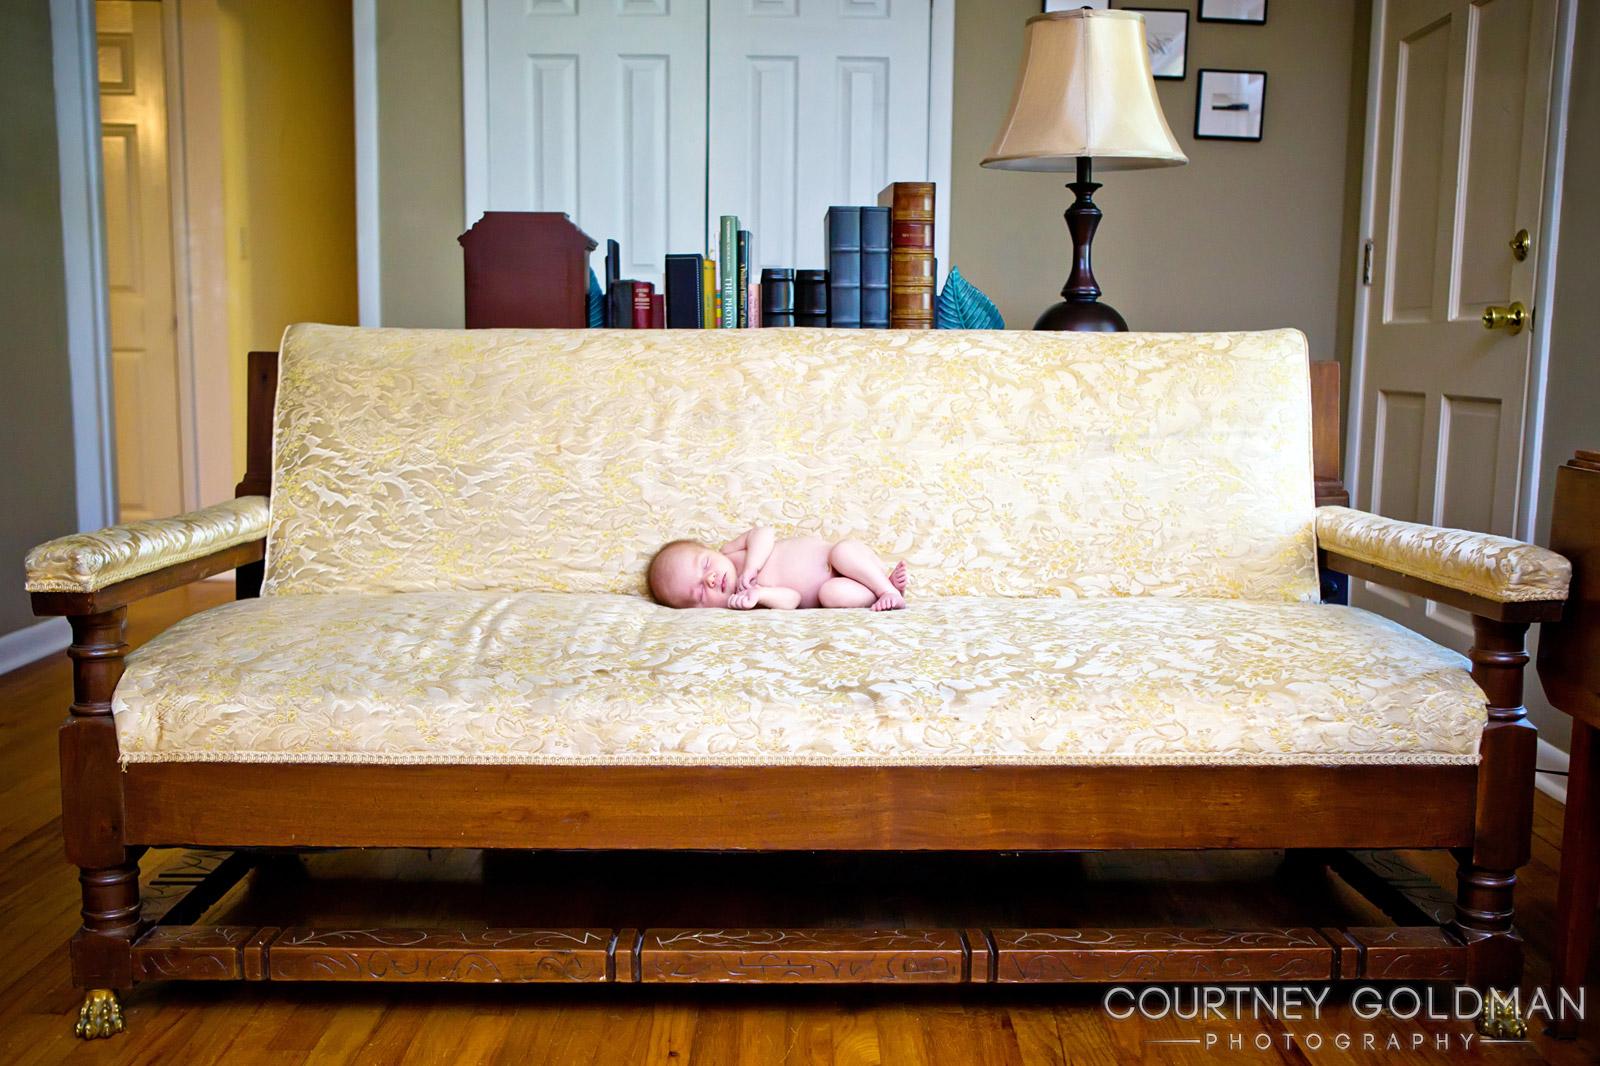 Atlanta Maternity and Newborn Photography by Courtney Goldman 66.jpg